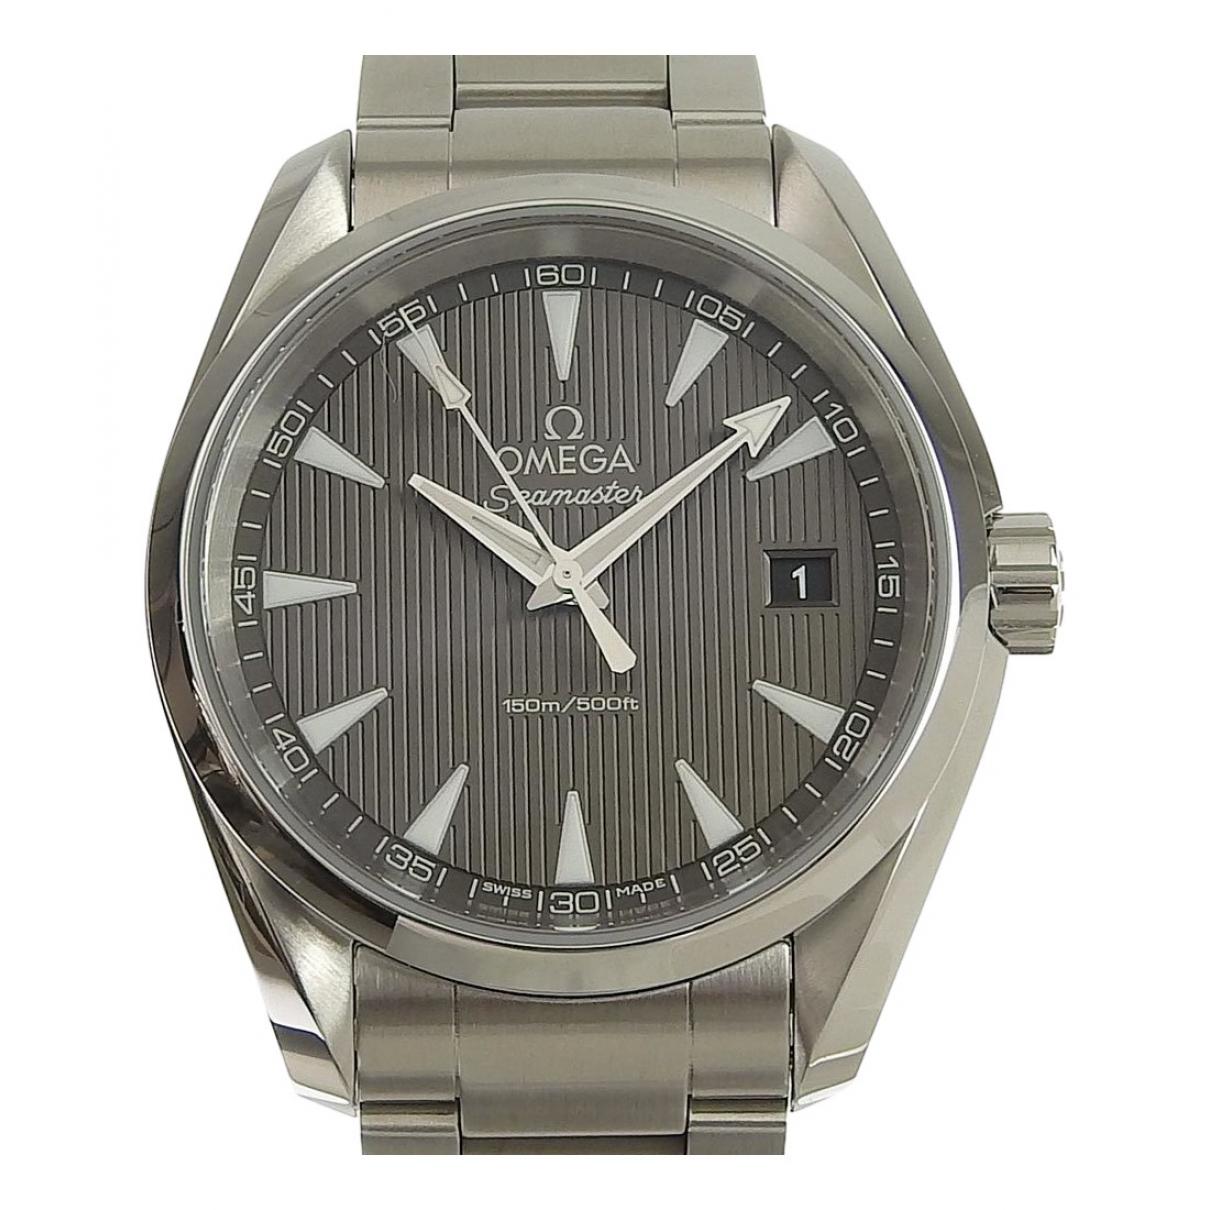 Relojes Seamaster Aquaterra Omega